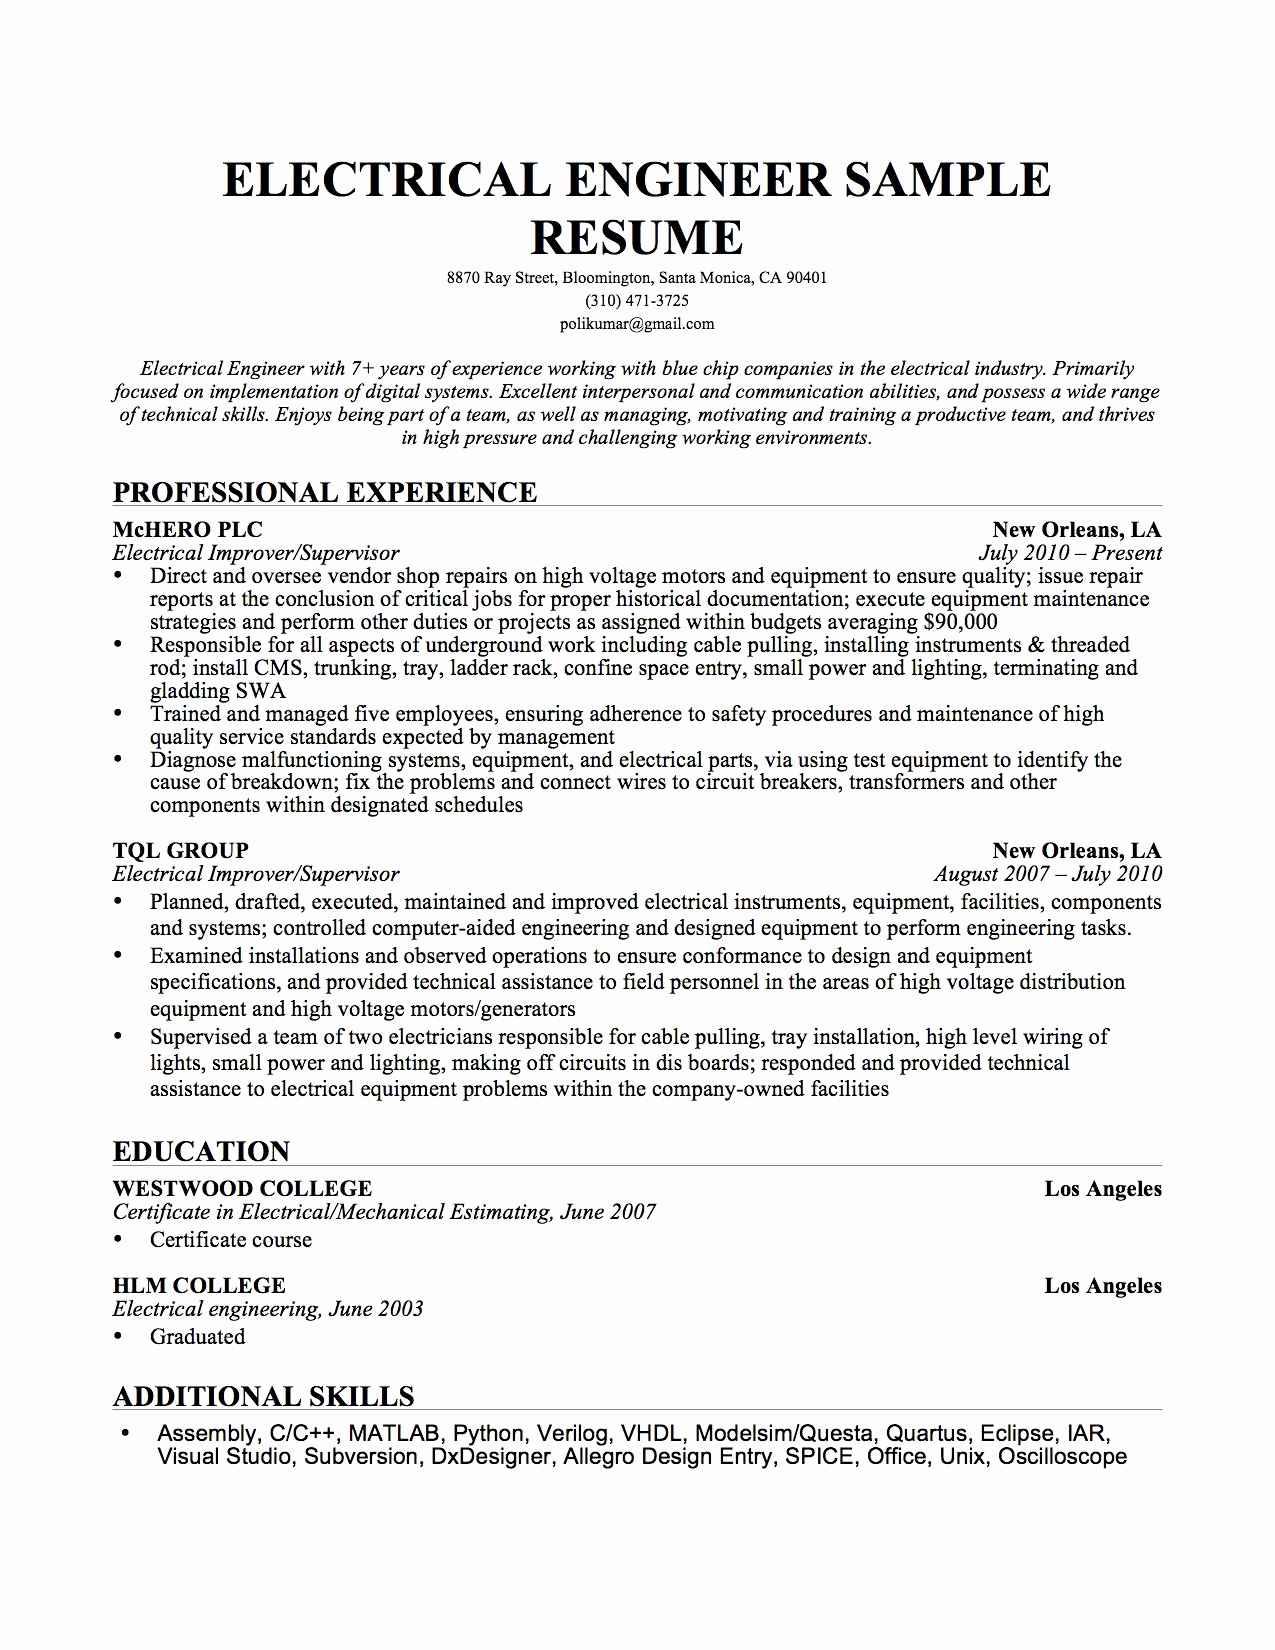 Xlri Resume Format